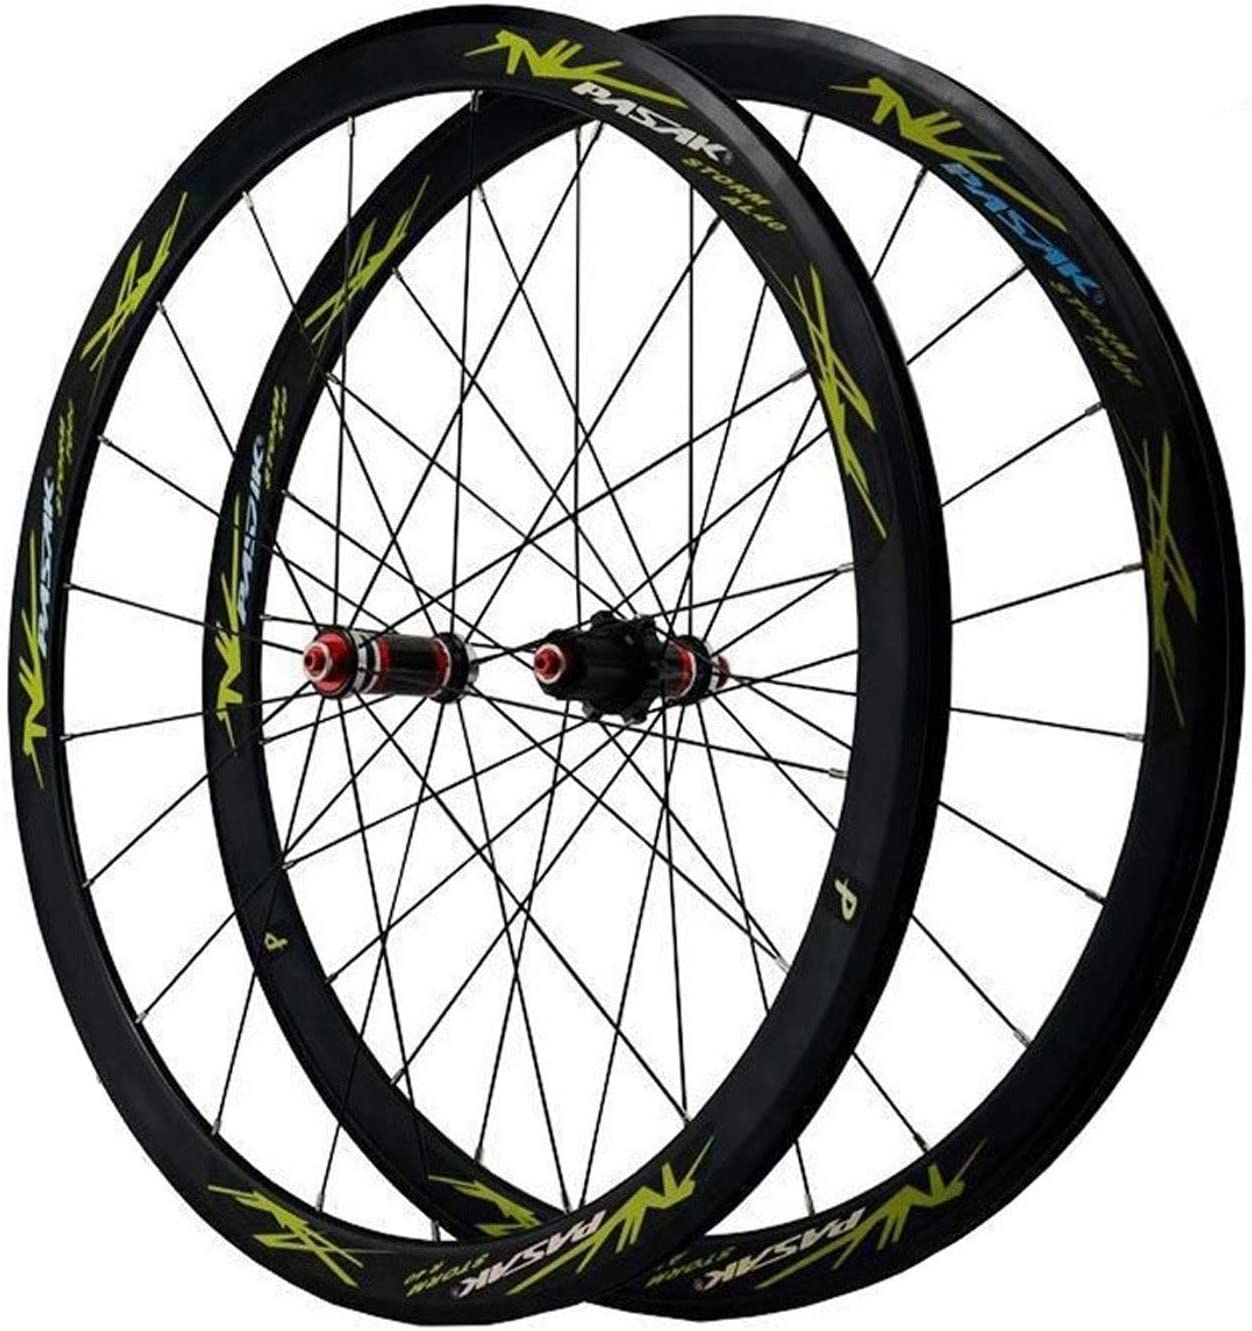 Road Mesa Mall Bike Wheelset 700C V-Brake Racing 40MM Fibe Bicycle Carbon Bargain